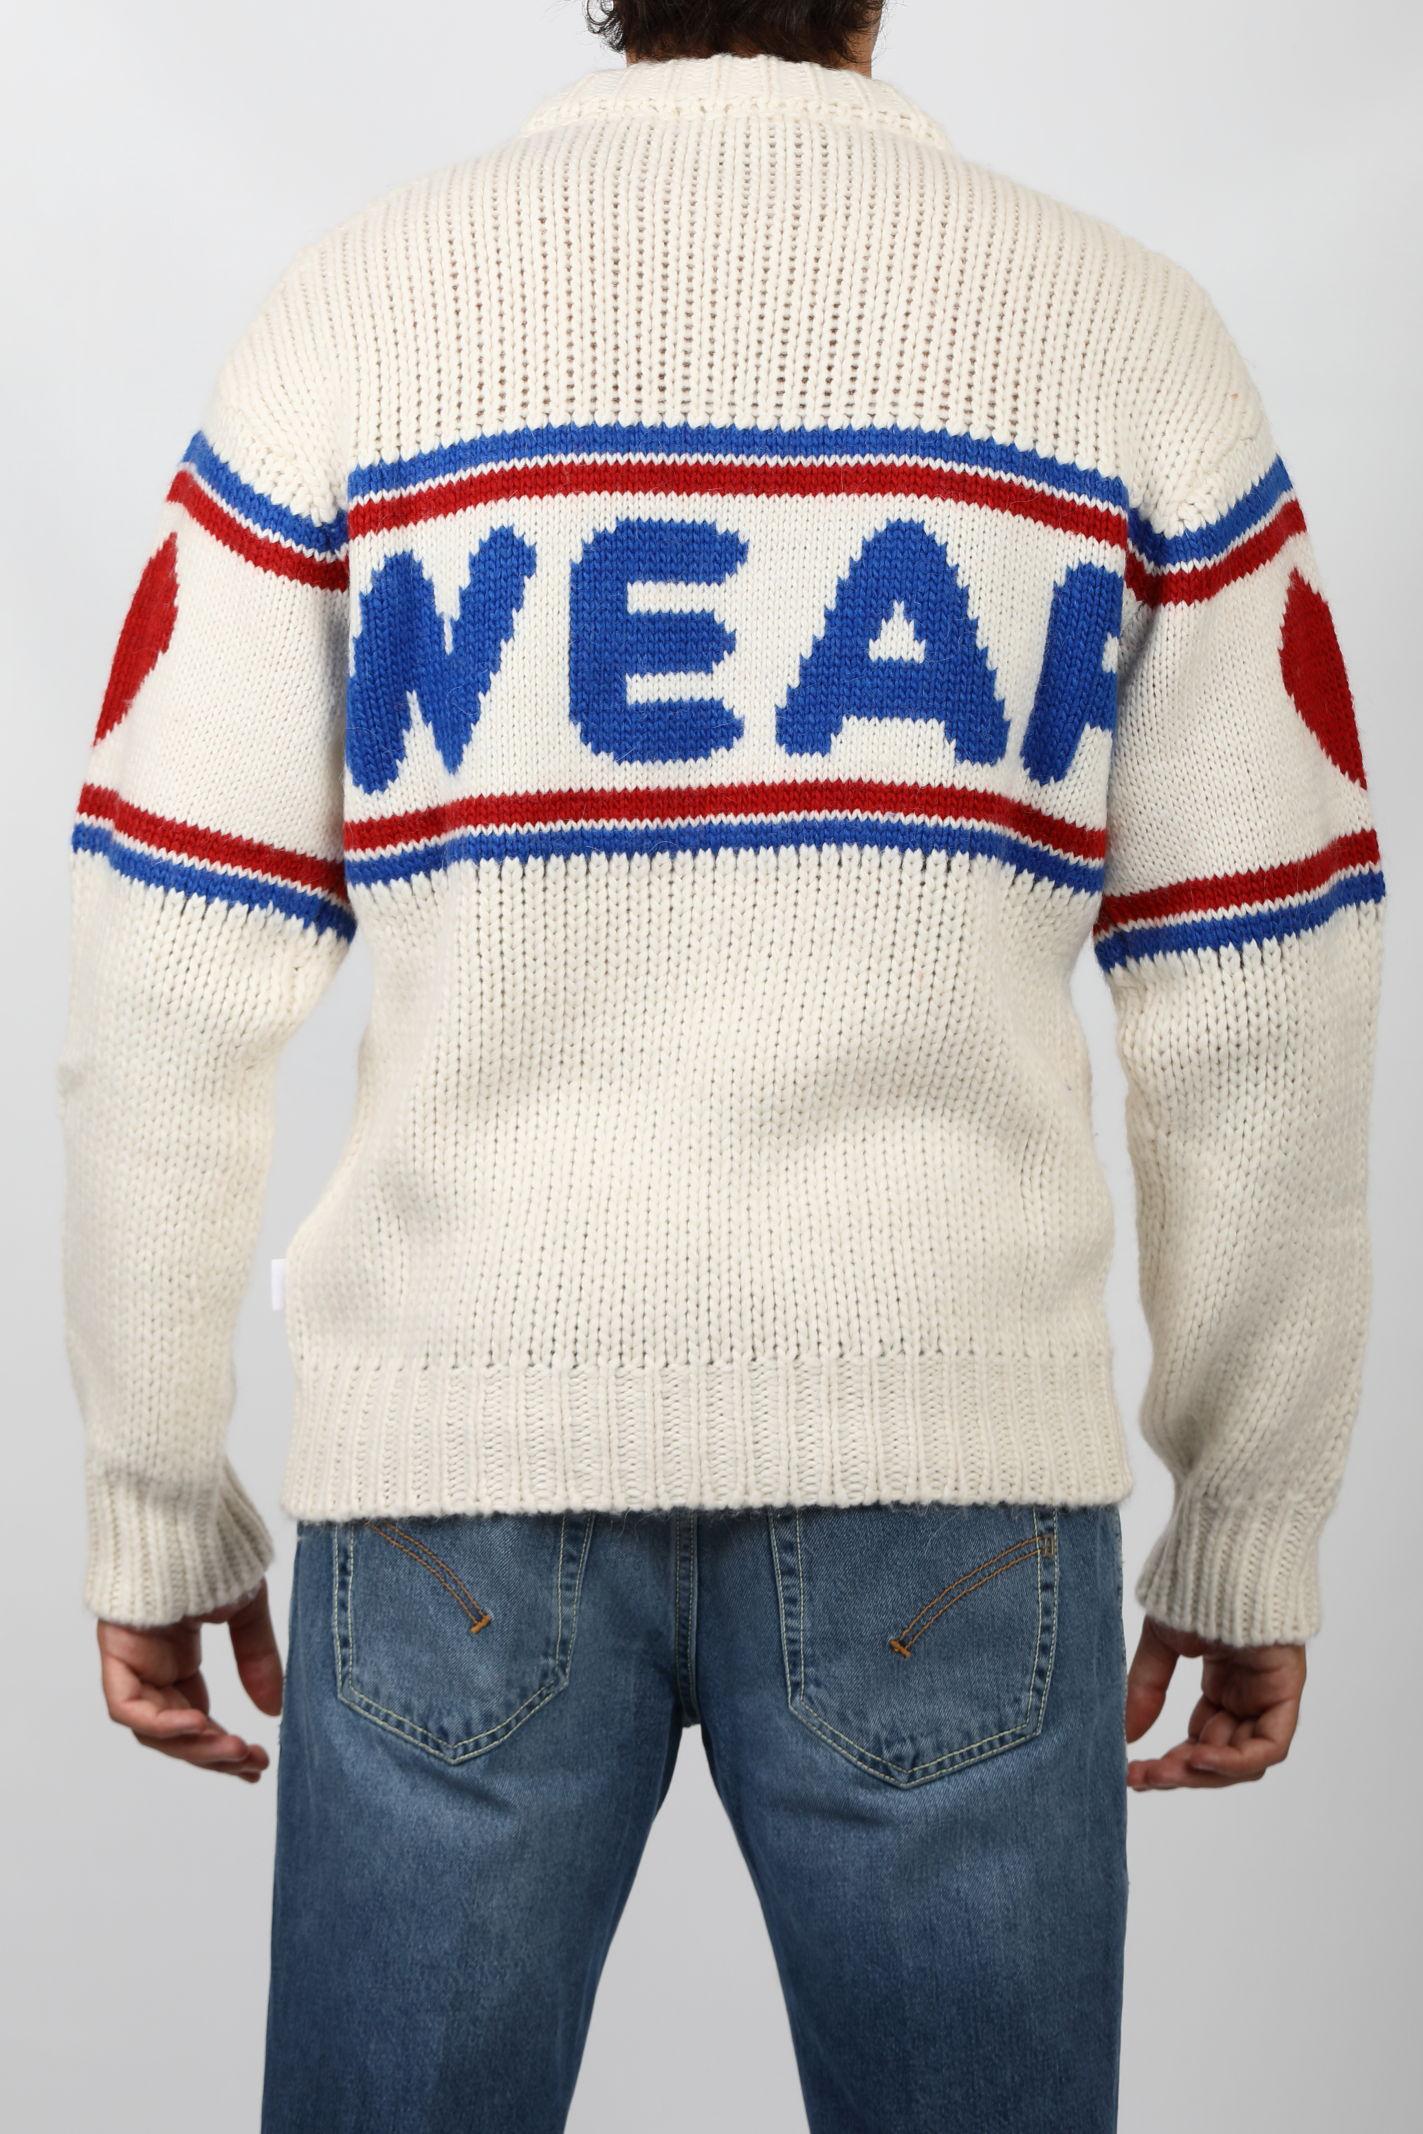 TAPE LOGO SWEATER GCDS   Knitwear   CC94M02116066